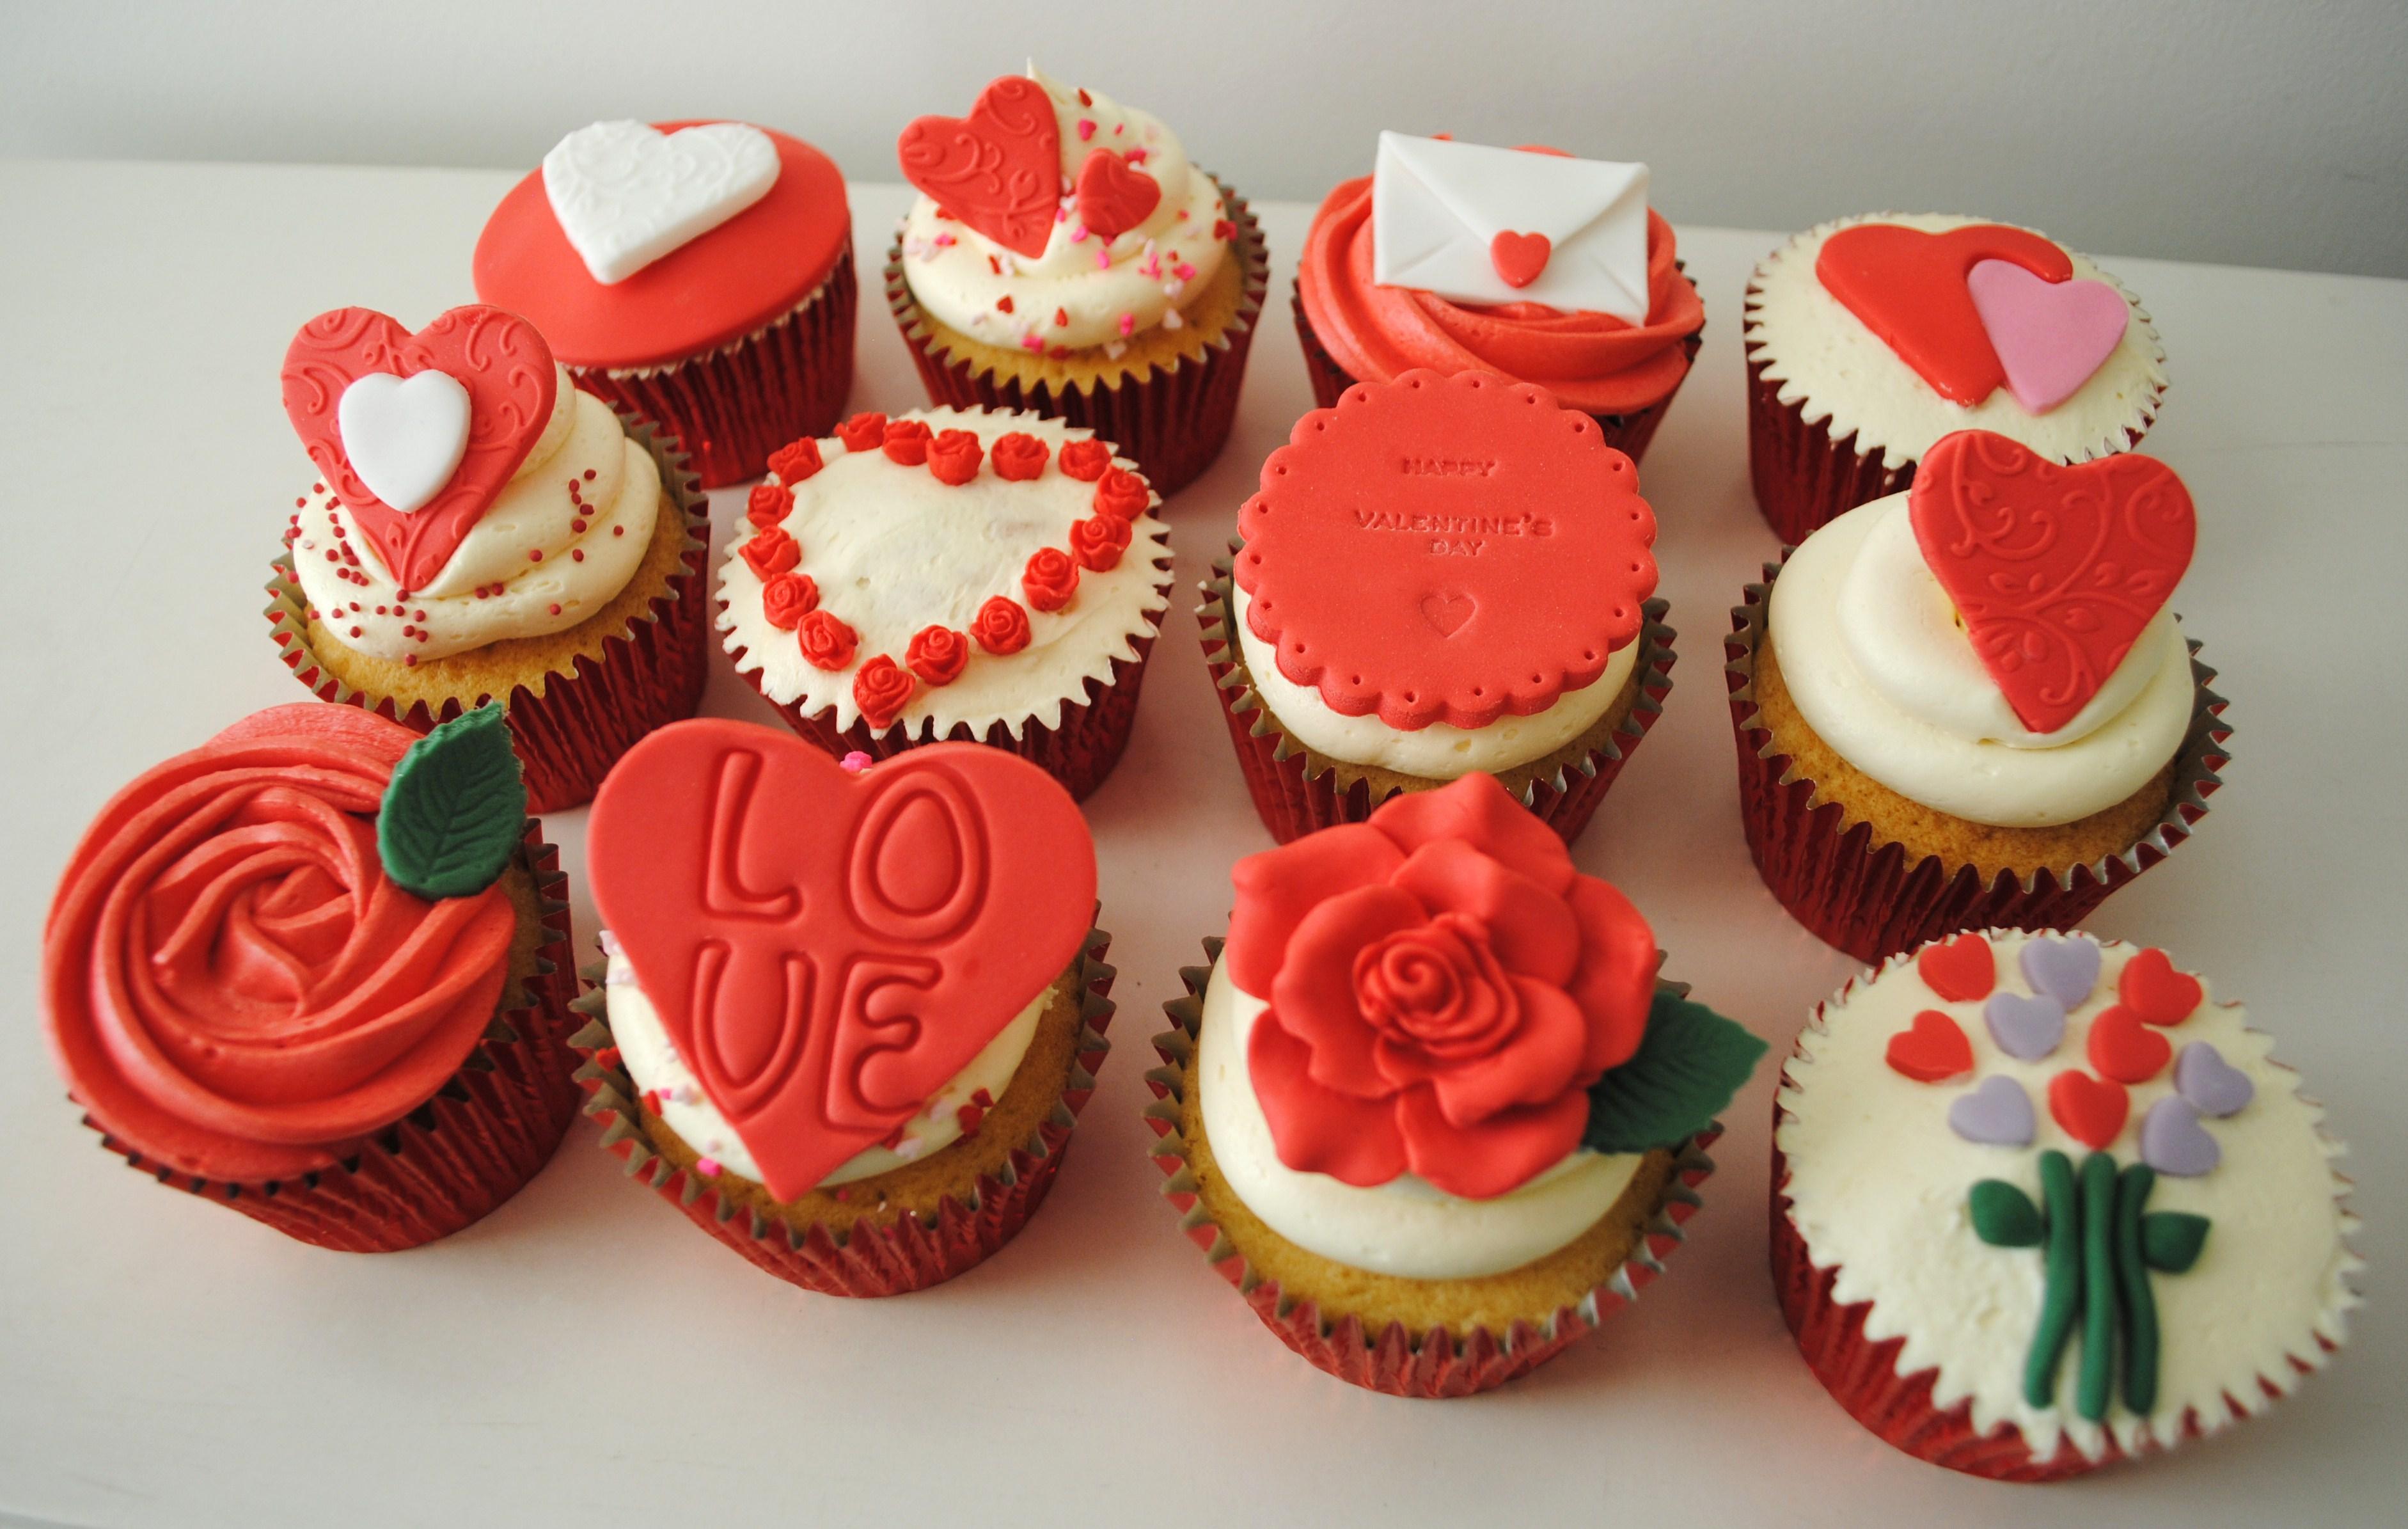 x12 cupcake box set 24 - Cupcake Valentine Box